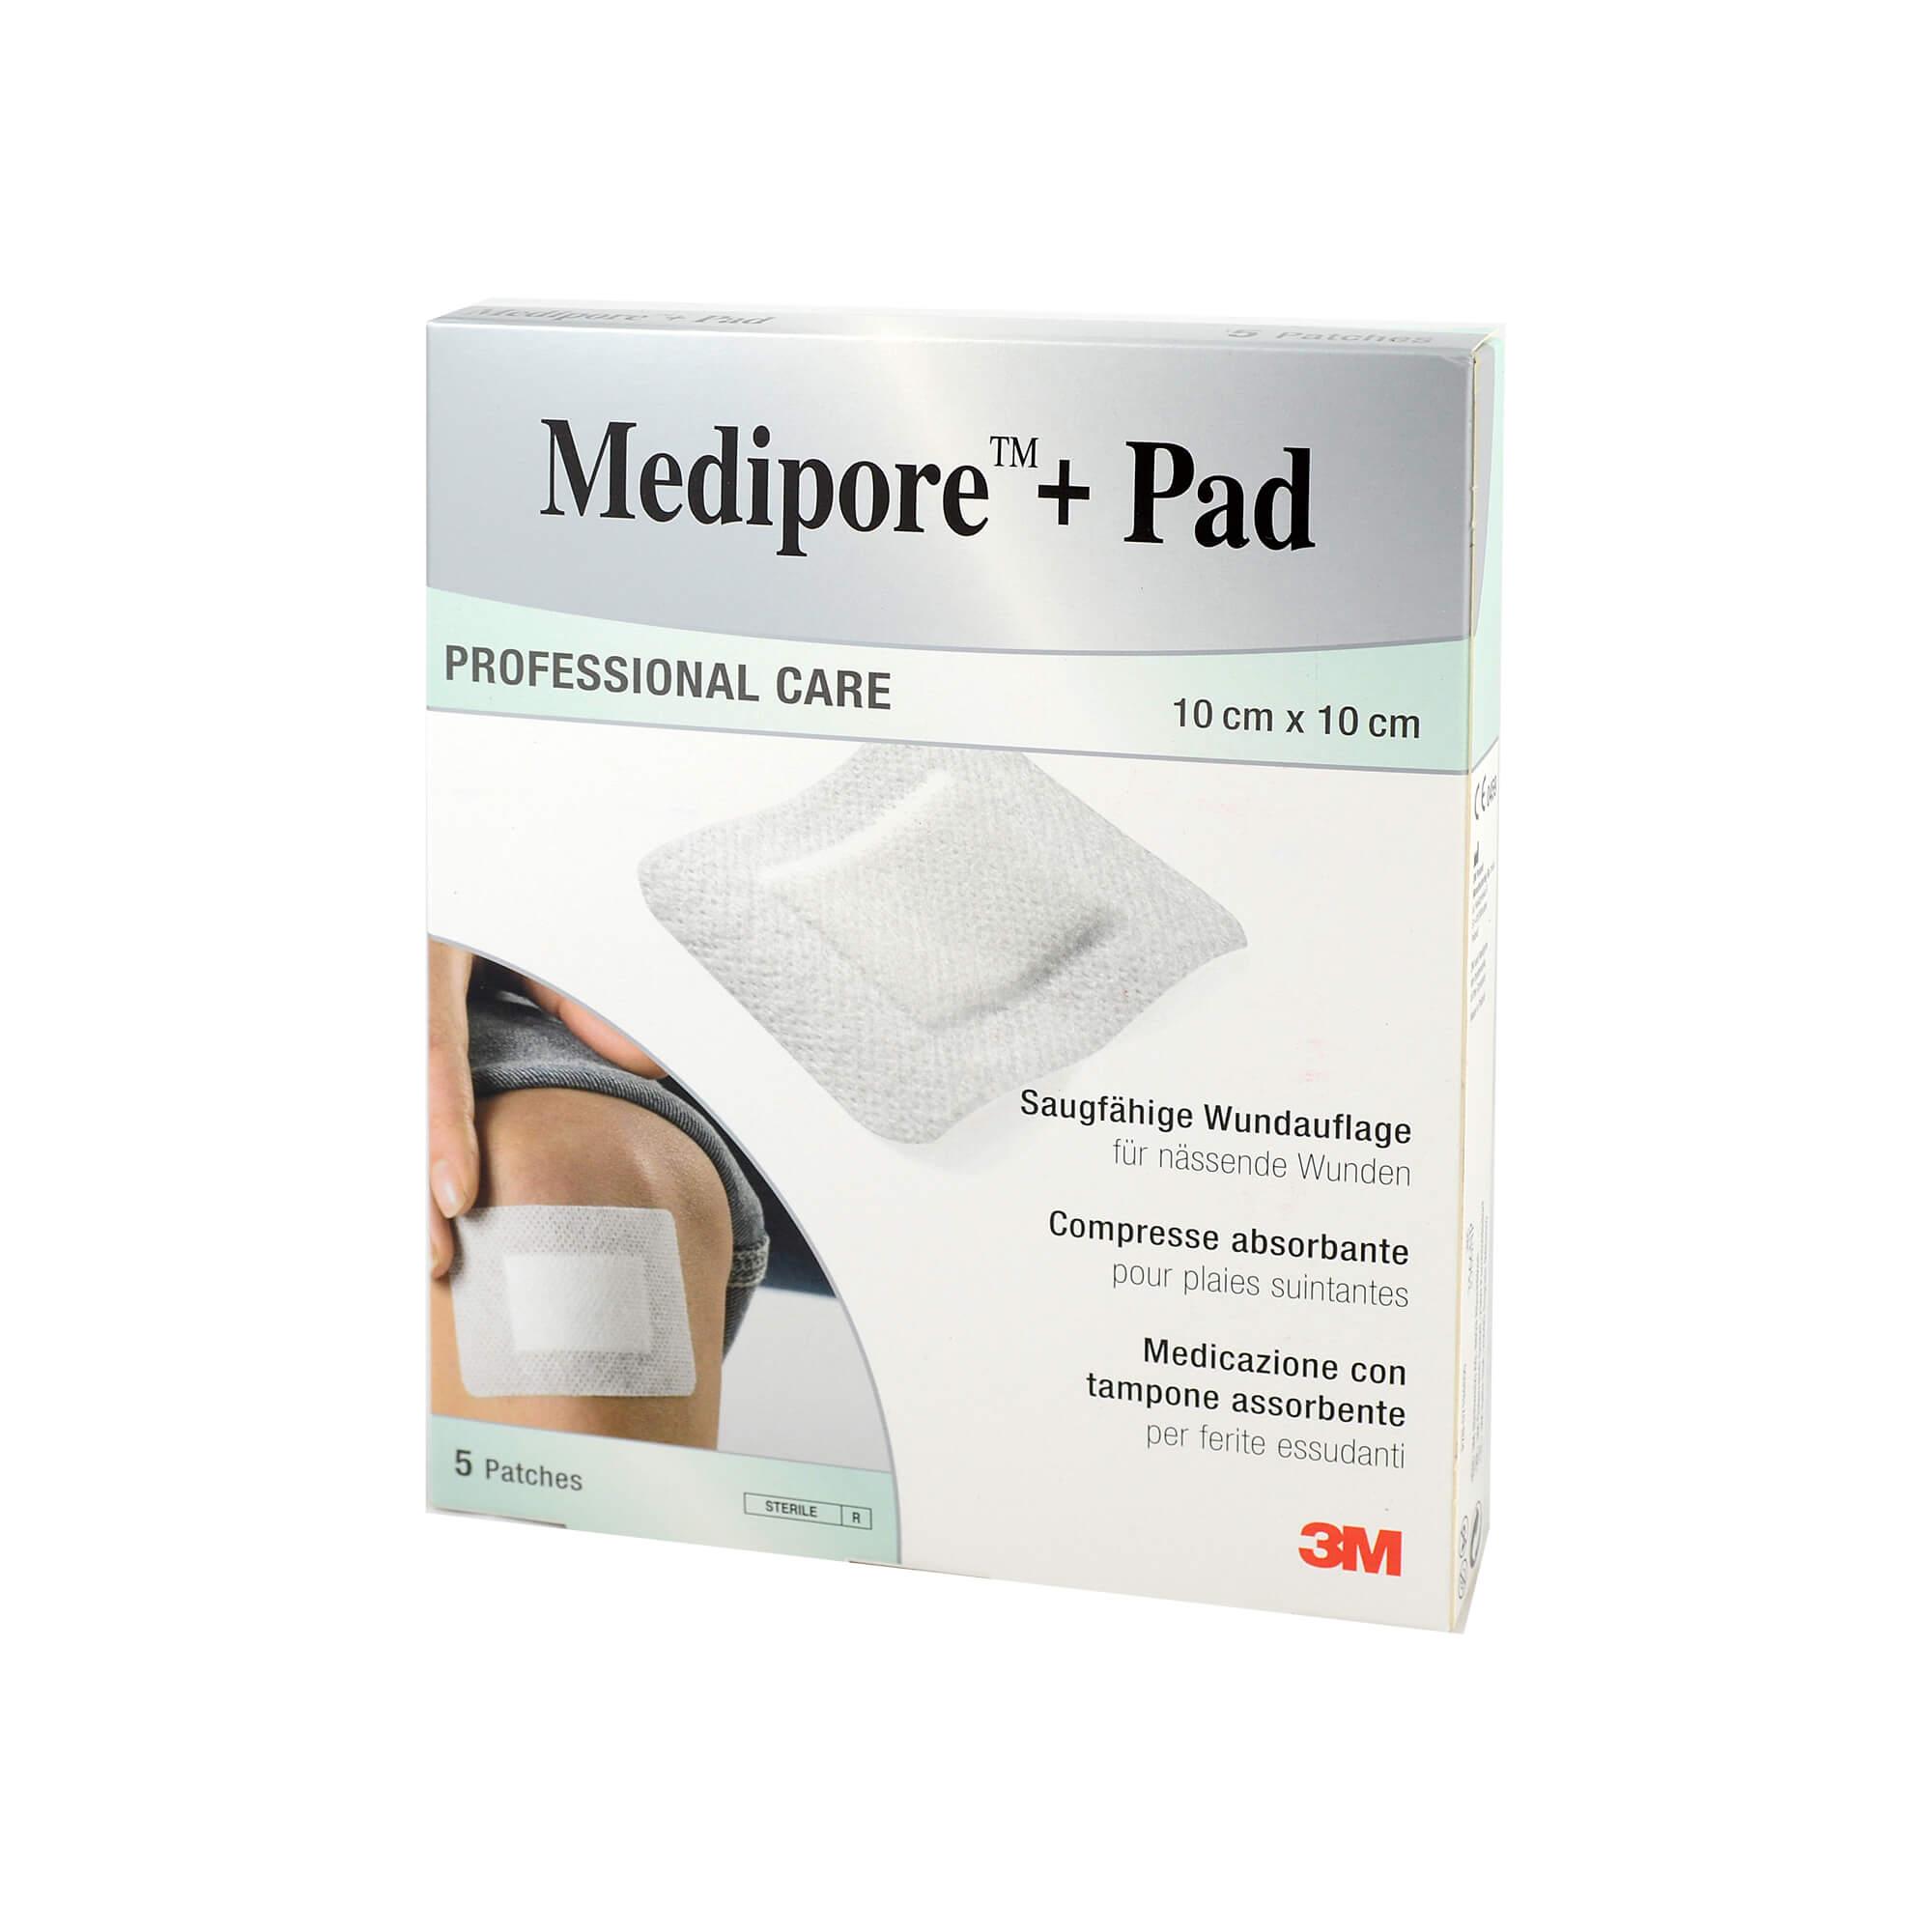 Medipore + Pad 3M 10x10cm 3566np Pflaster